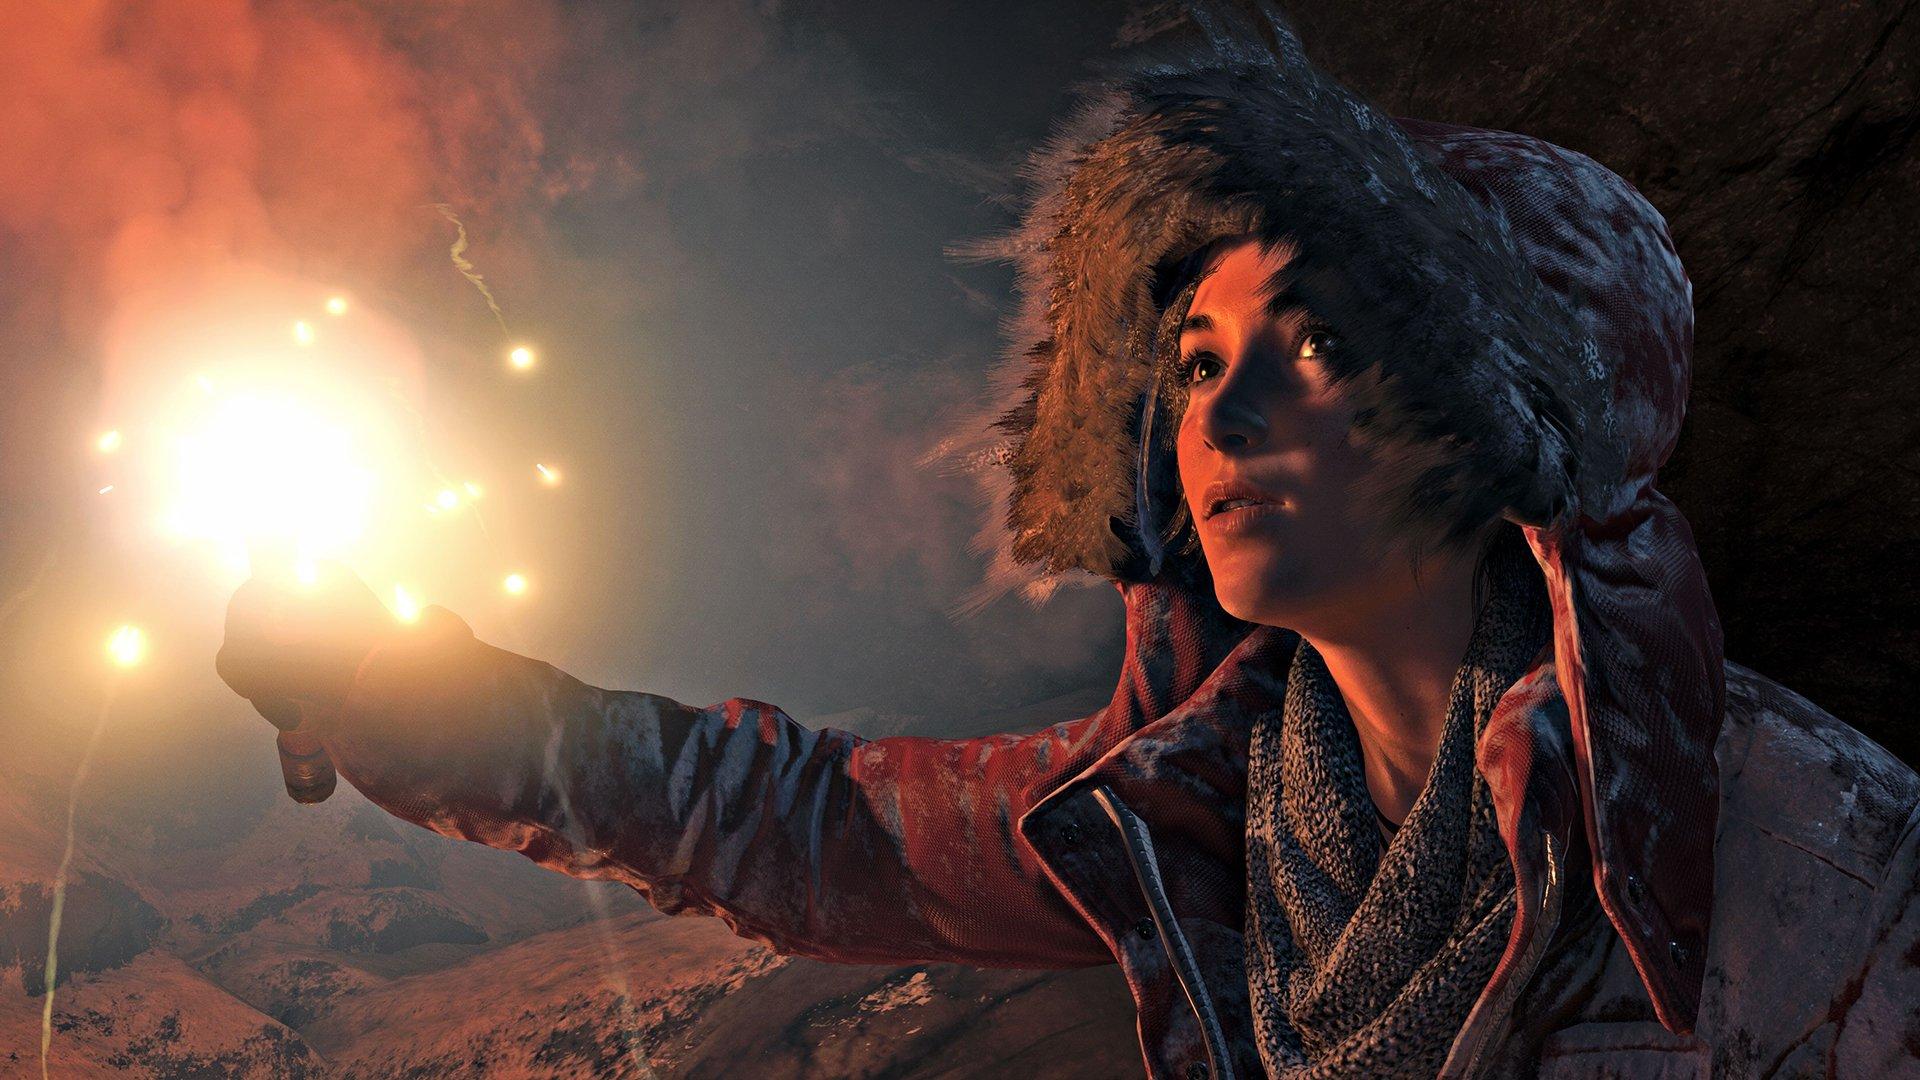 Гайд по испытаниям в Rise of the Tomb Raider - Изображение 1